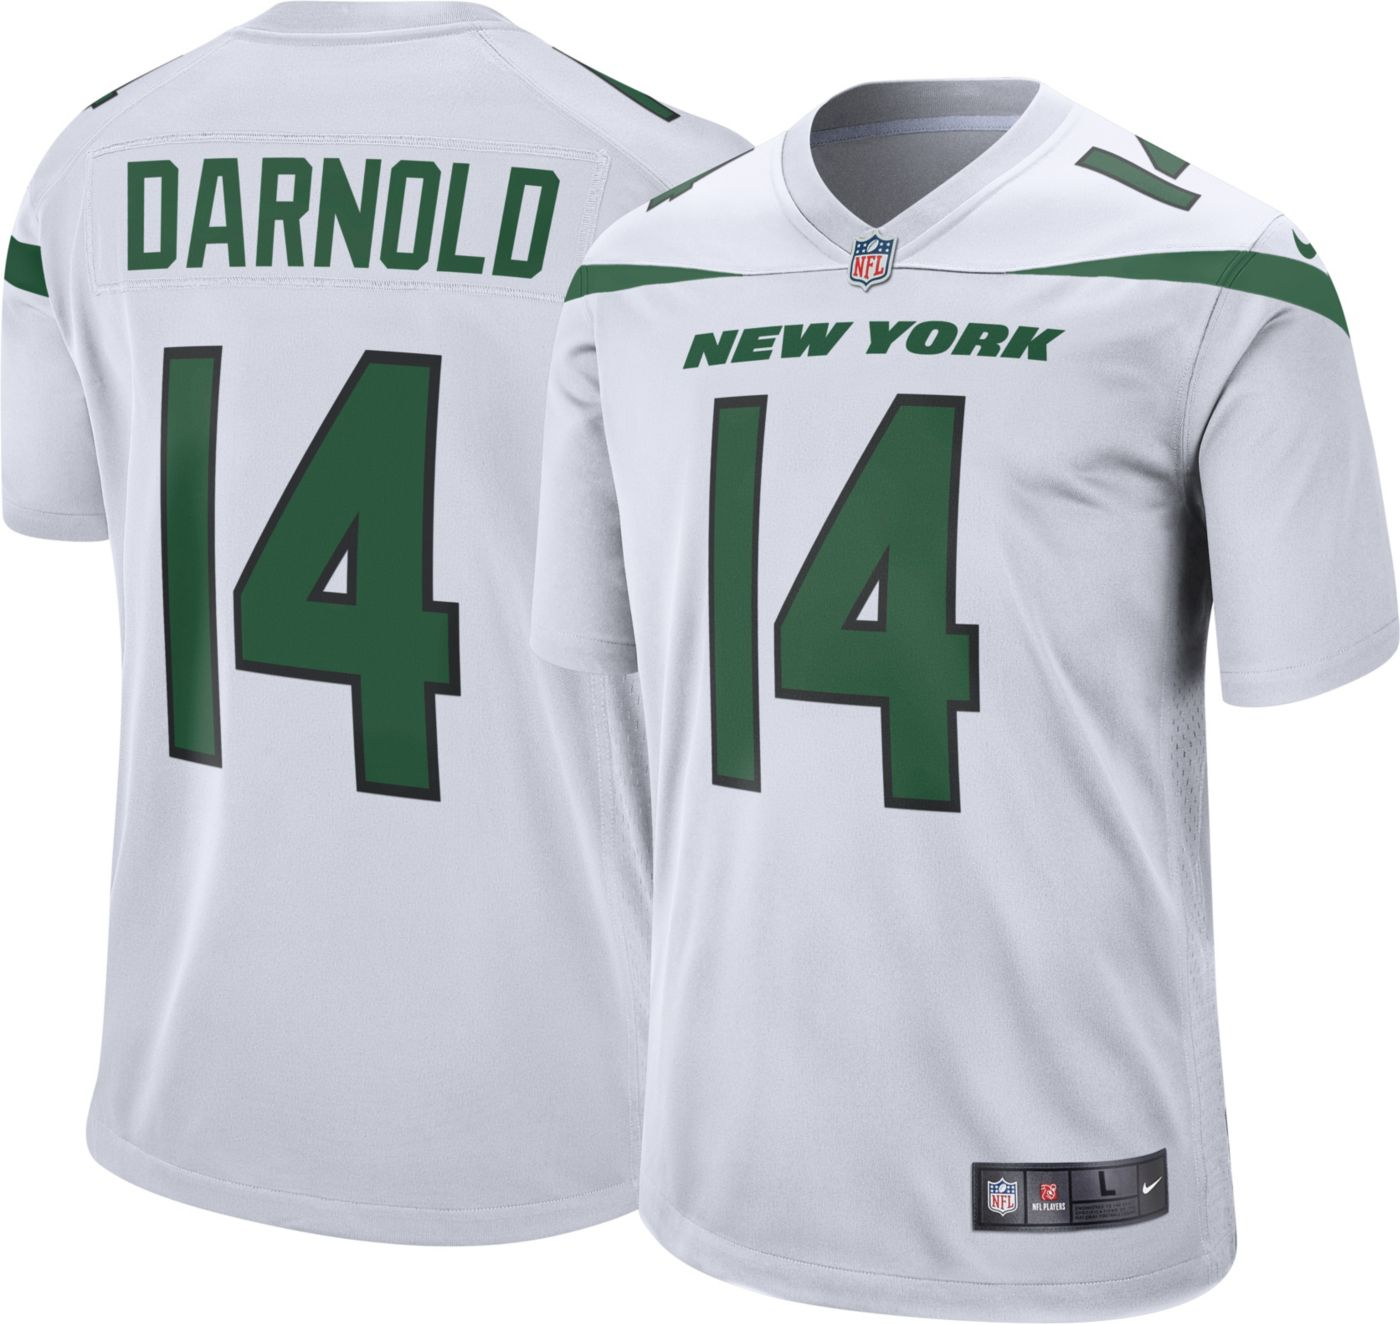 Nike Men's Away Game Jersey New York Jets Sam Darnold #14